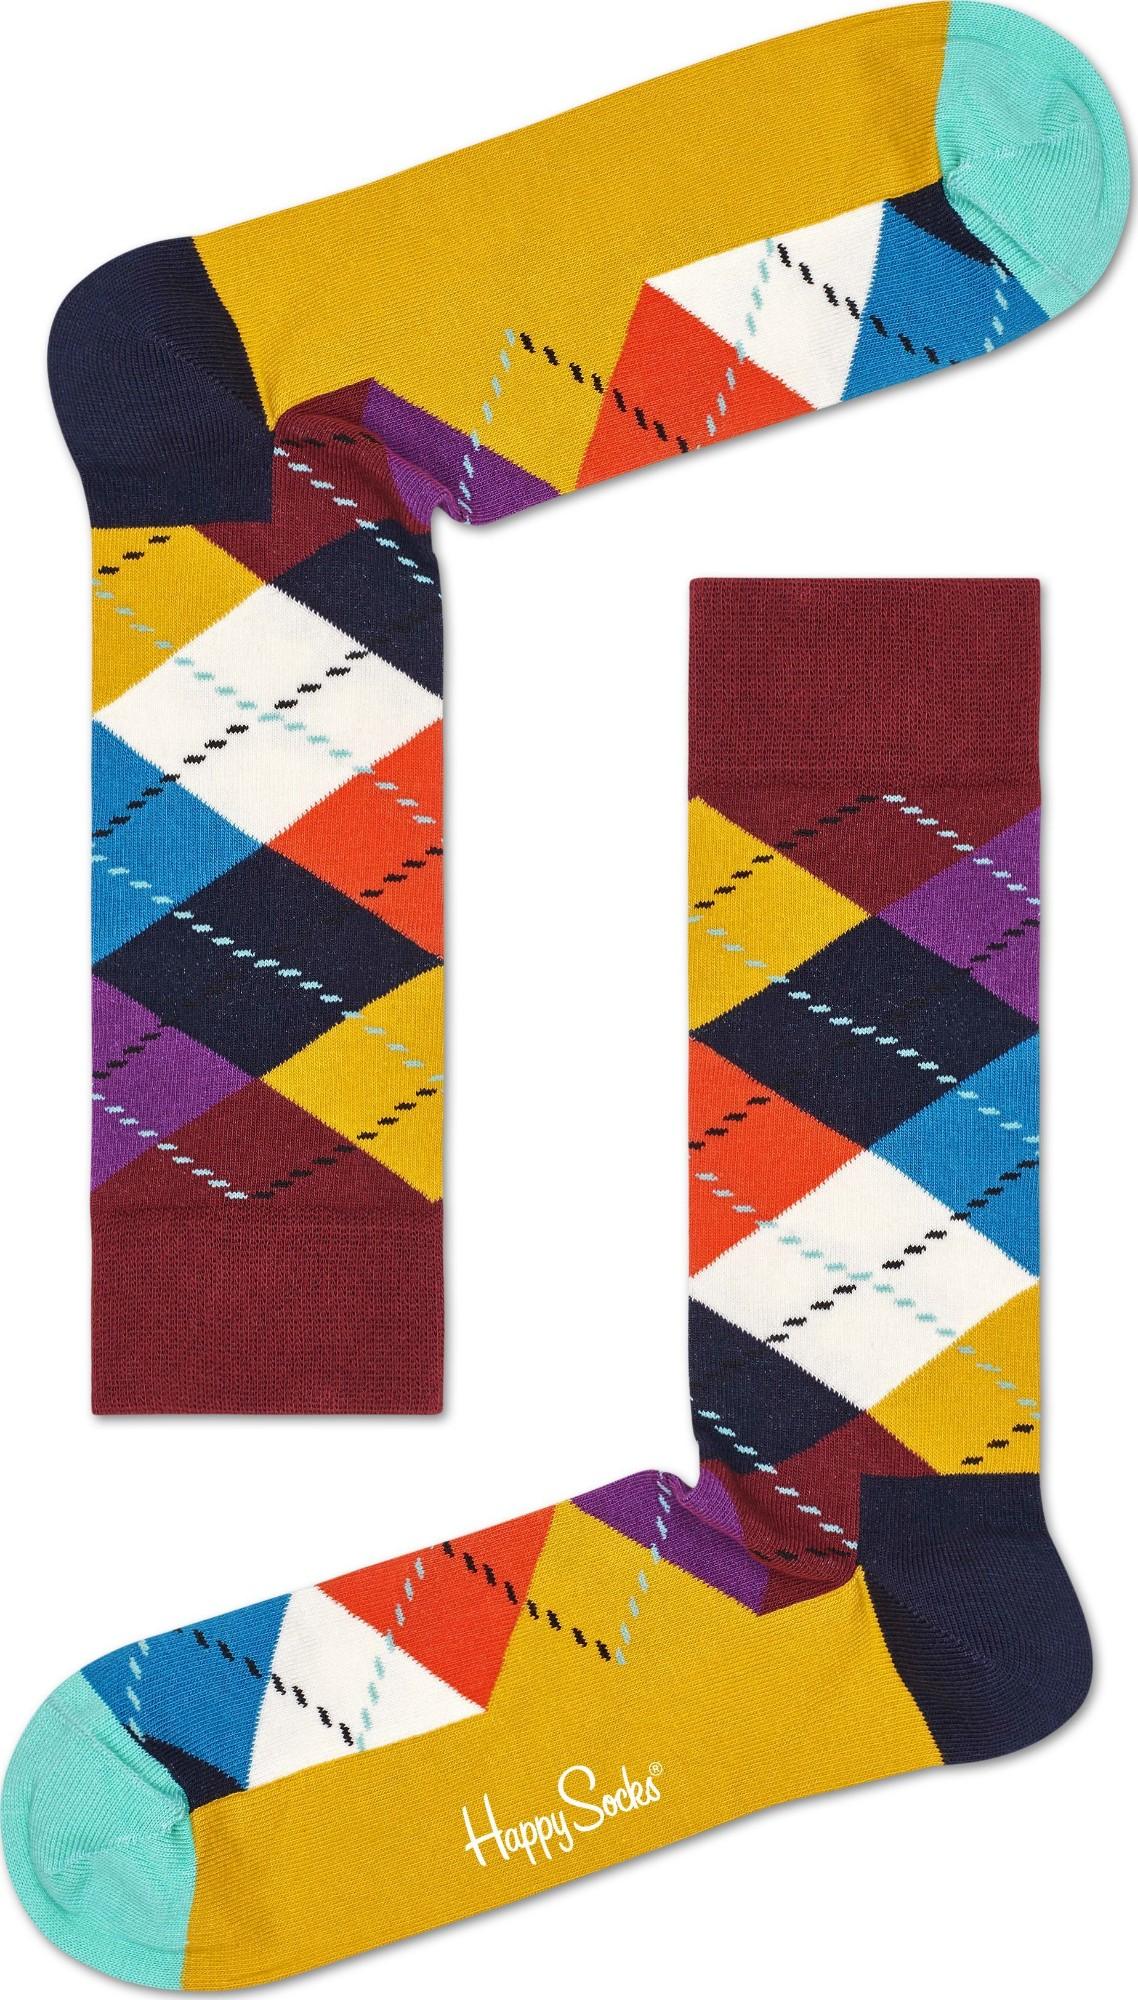 Happy Socks Argyle Multi 2701 36-40